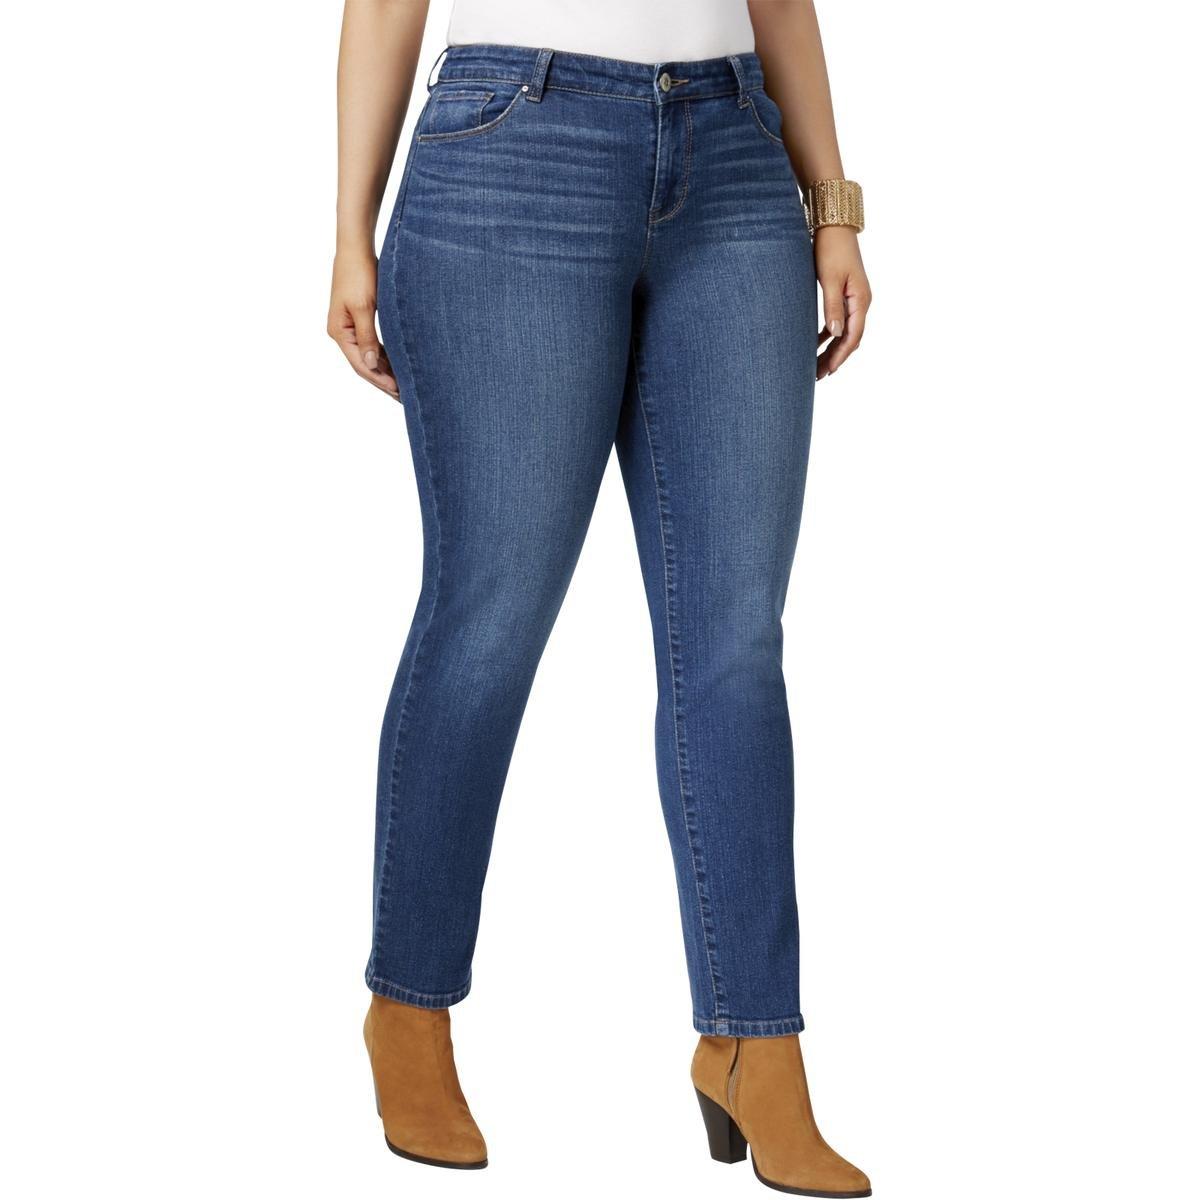 Style & Co. Womens Plus Mid-Rise Whisker Wash Slim Leg Jeans Blue 18W